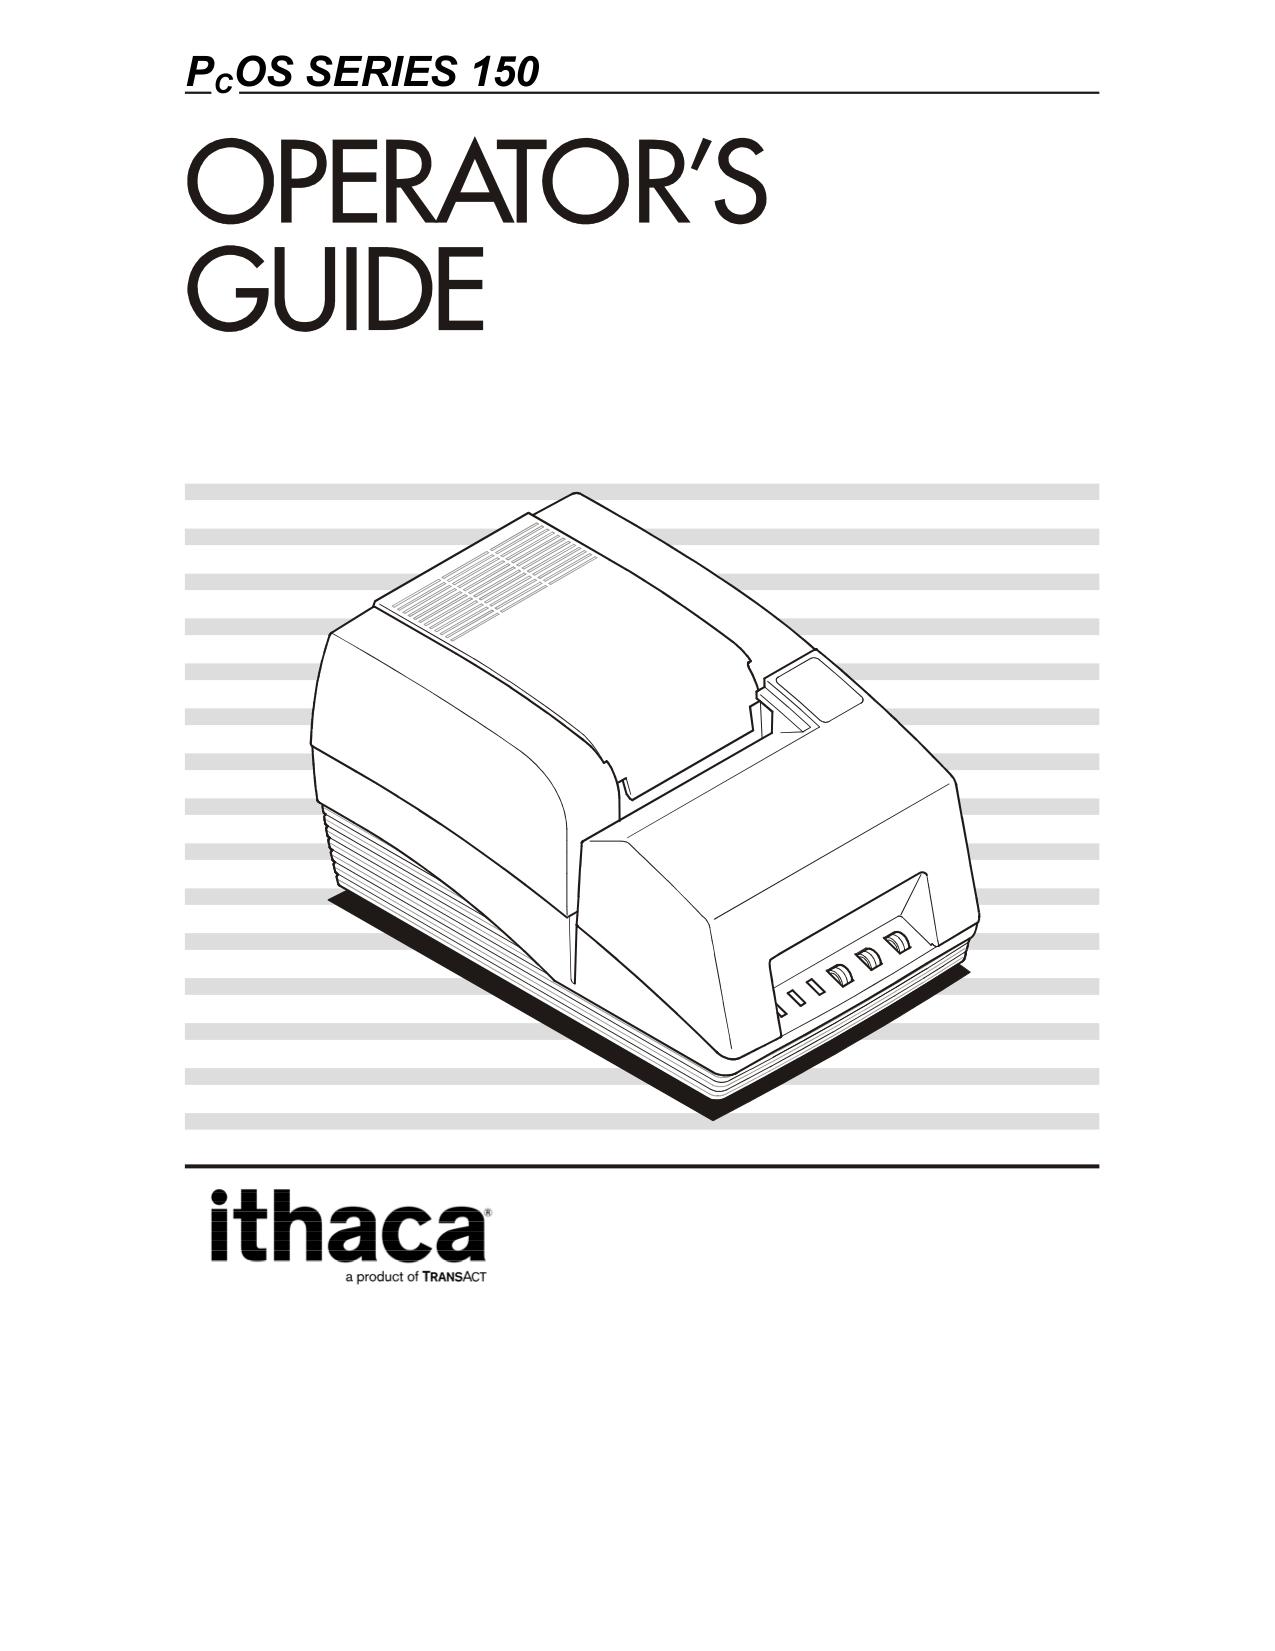 Ithaca 950 Printer Manual